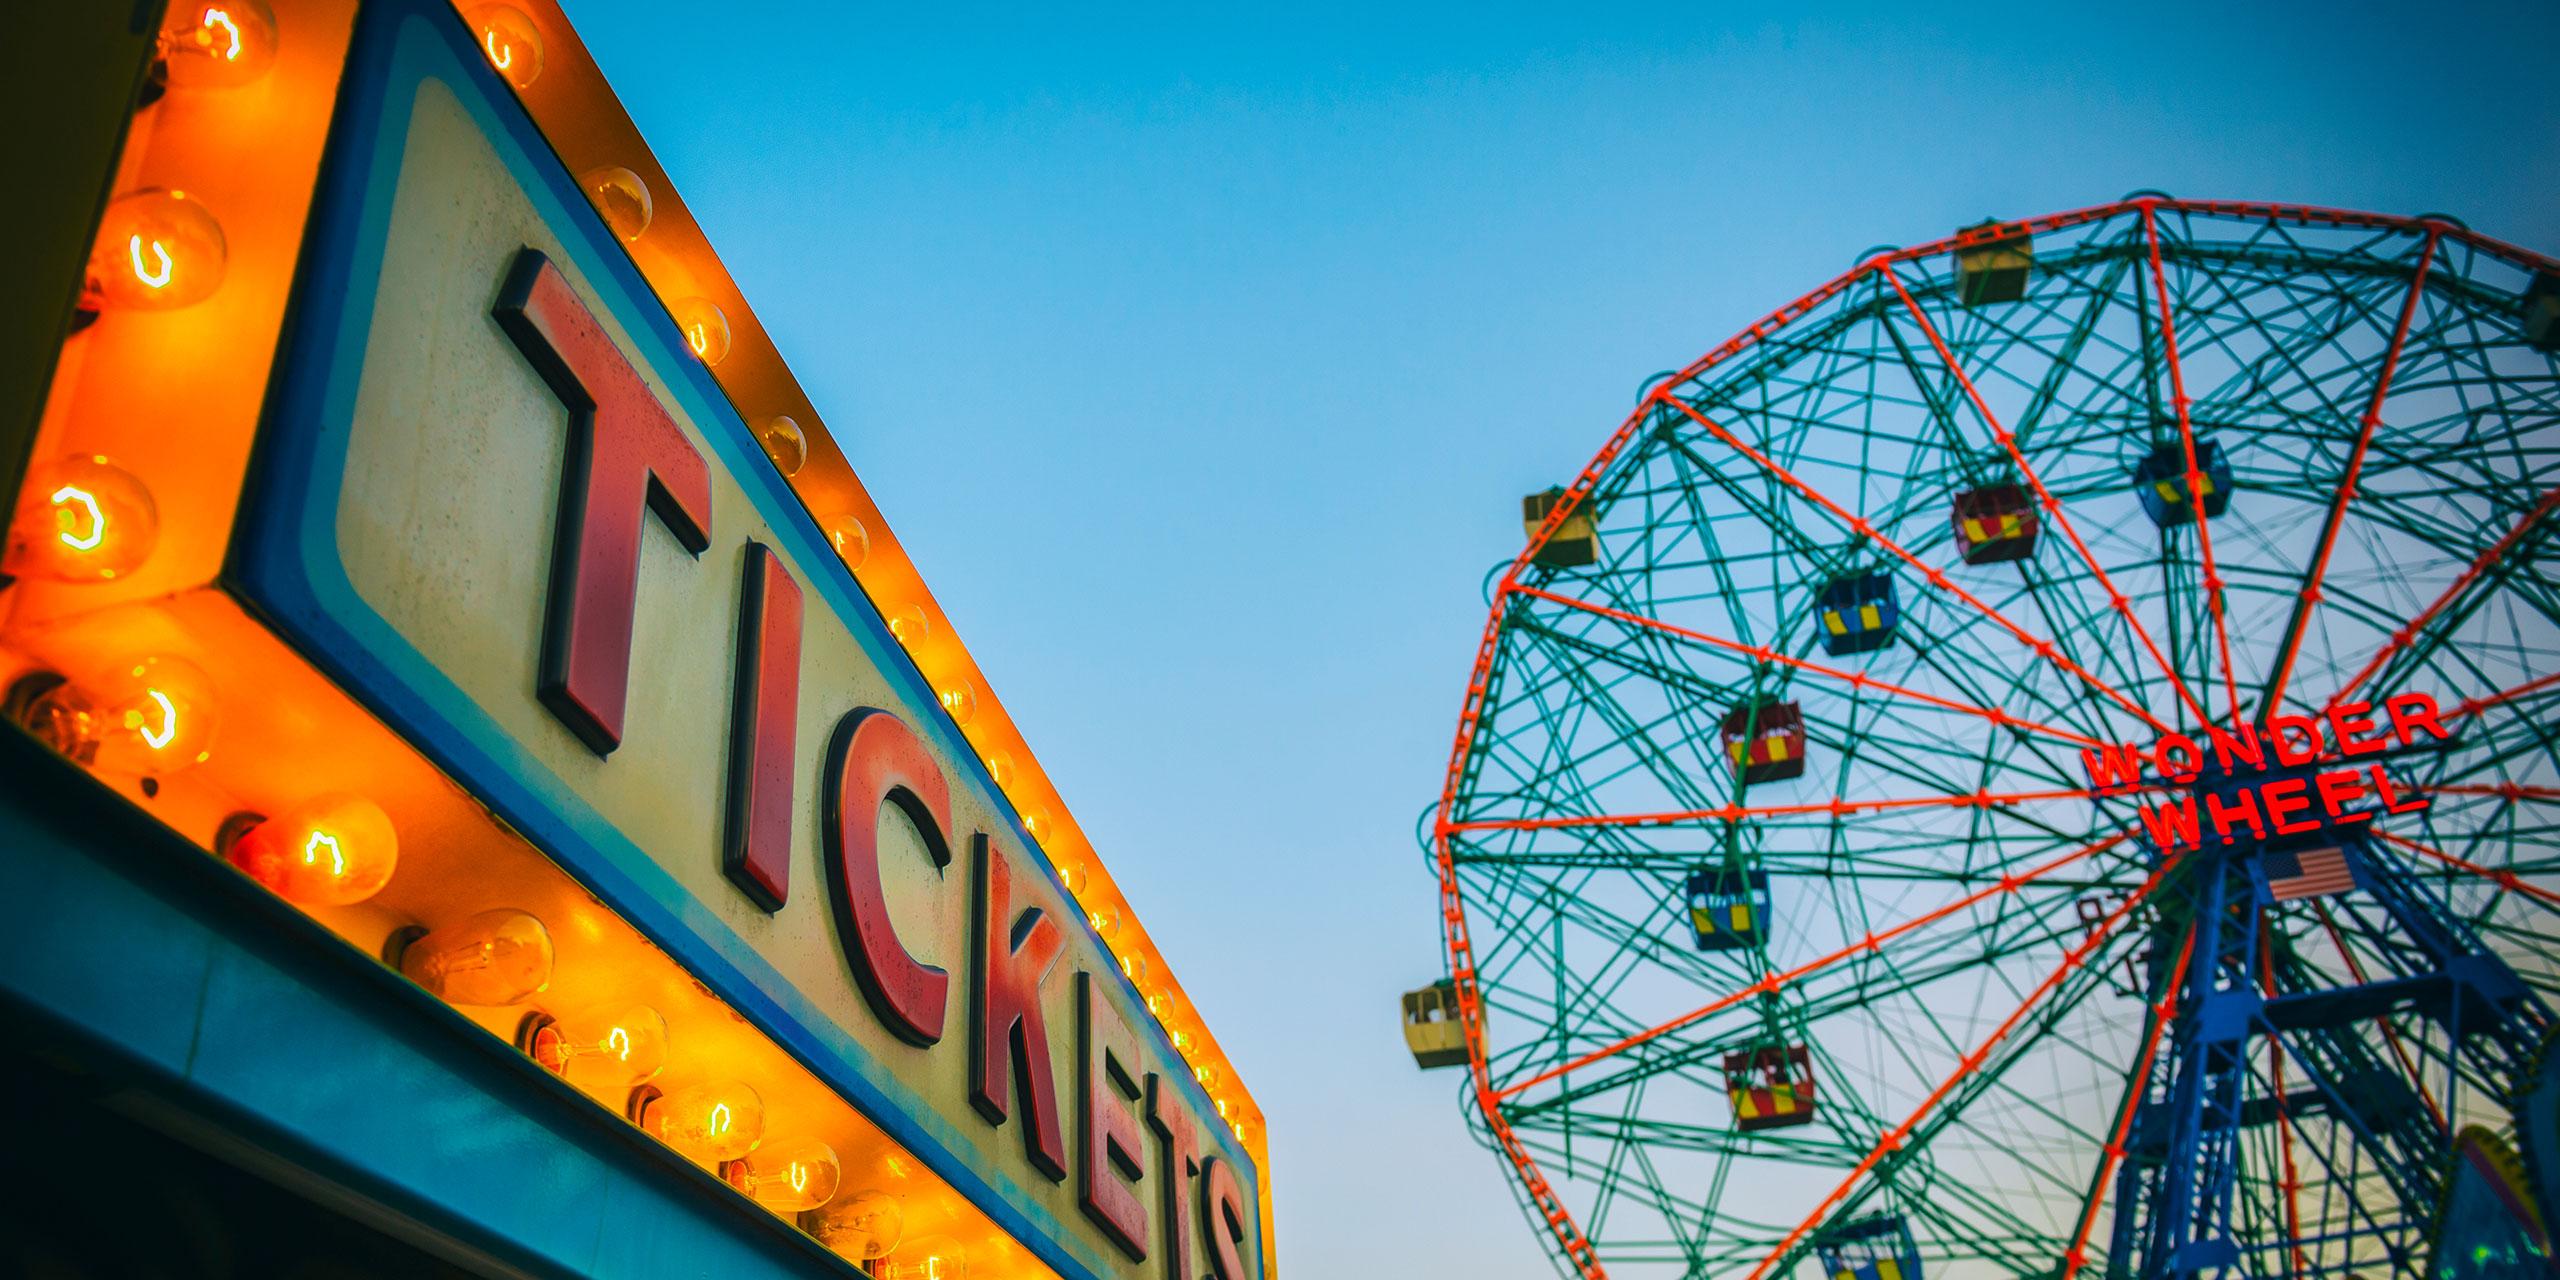 Coney Island Boardwalk; Courtesy of lazyllama/Shutterstock.com